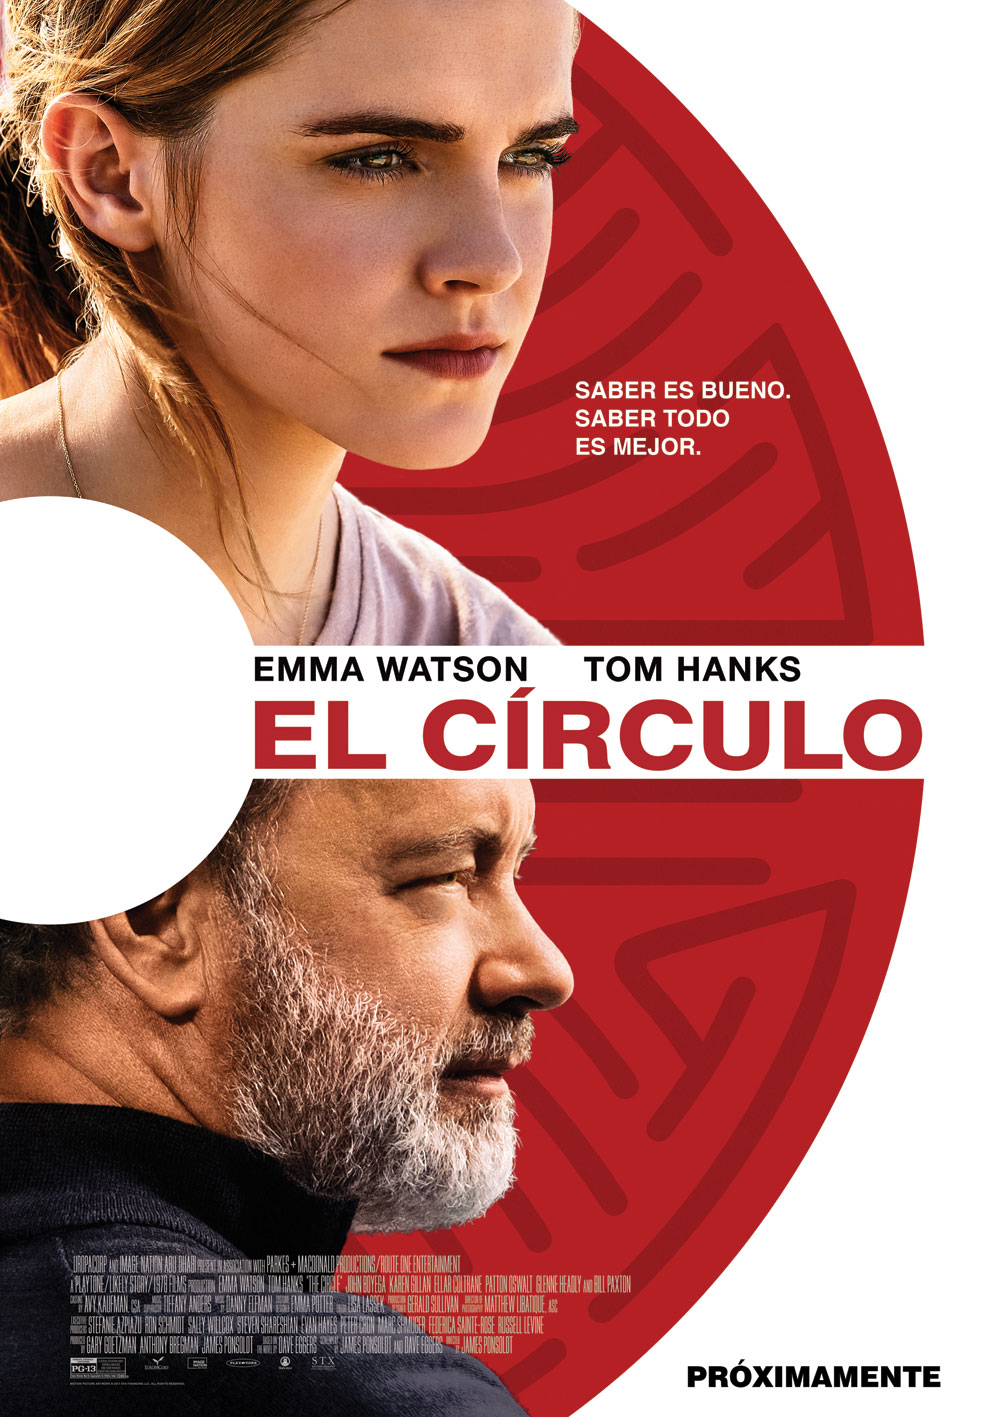 https://www.andesfilms.com.pe/el-circulo-2/